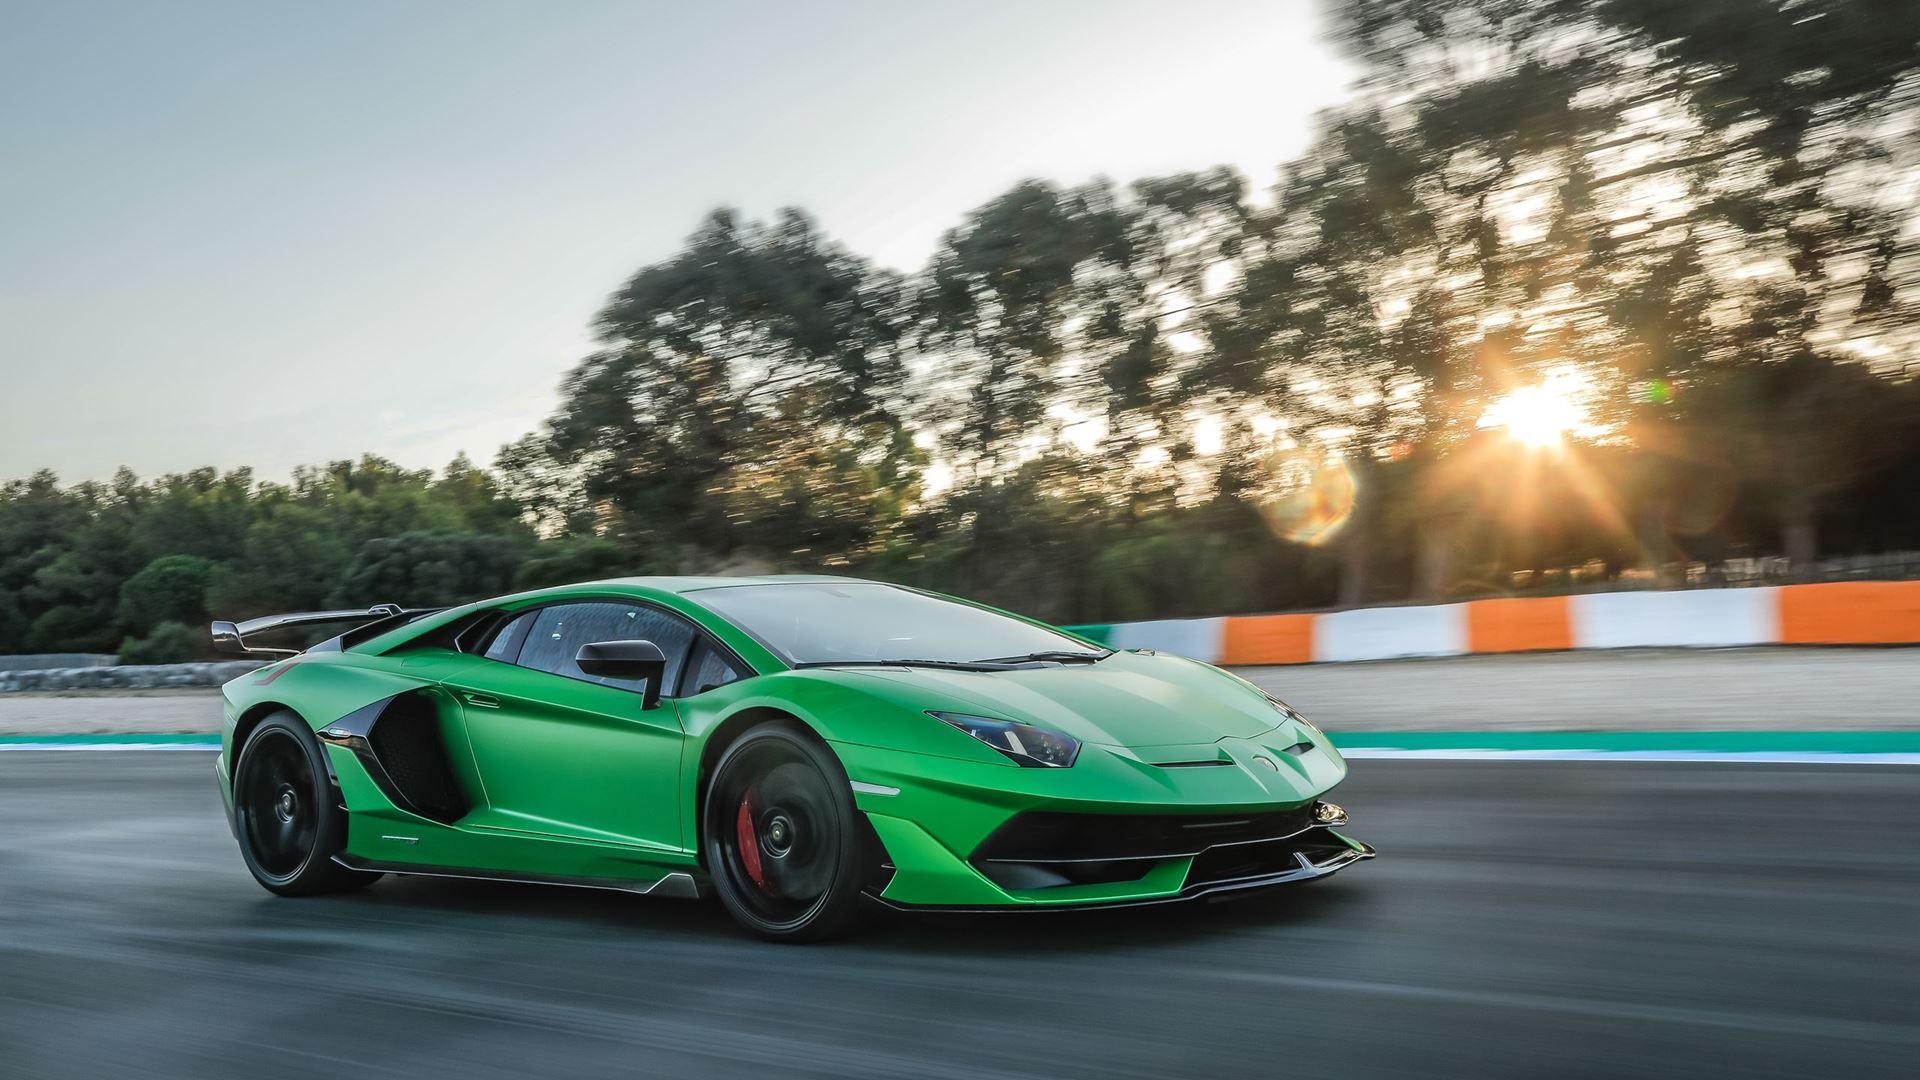 Automobili Lamborghini: sales soaring, record first quarter - Image 1